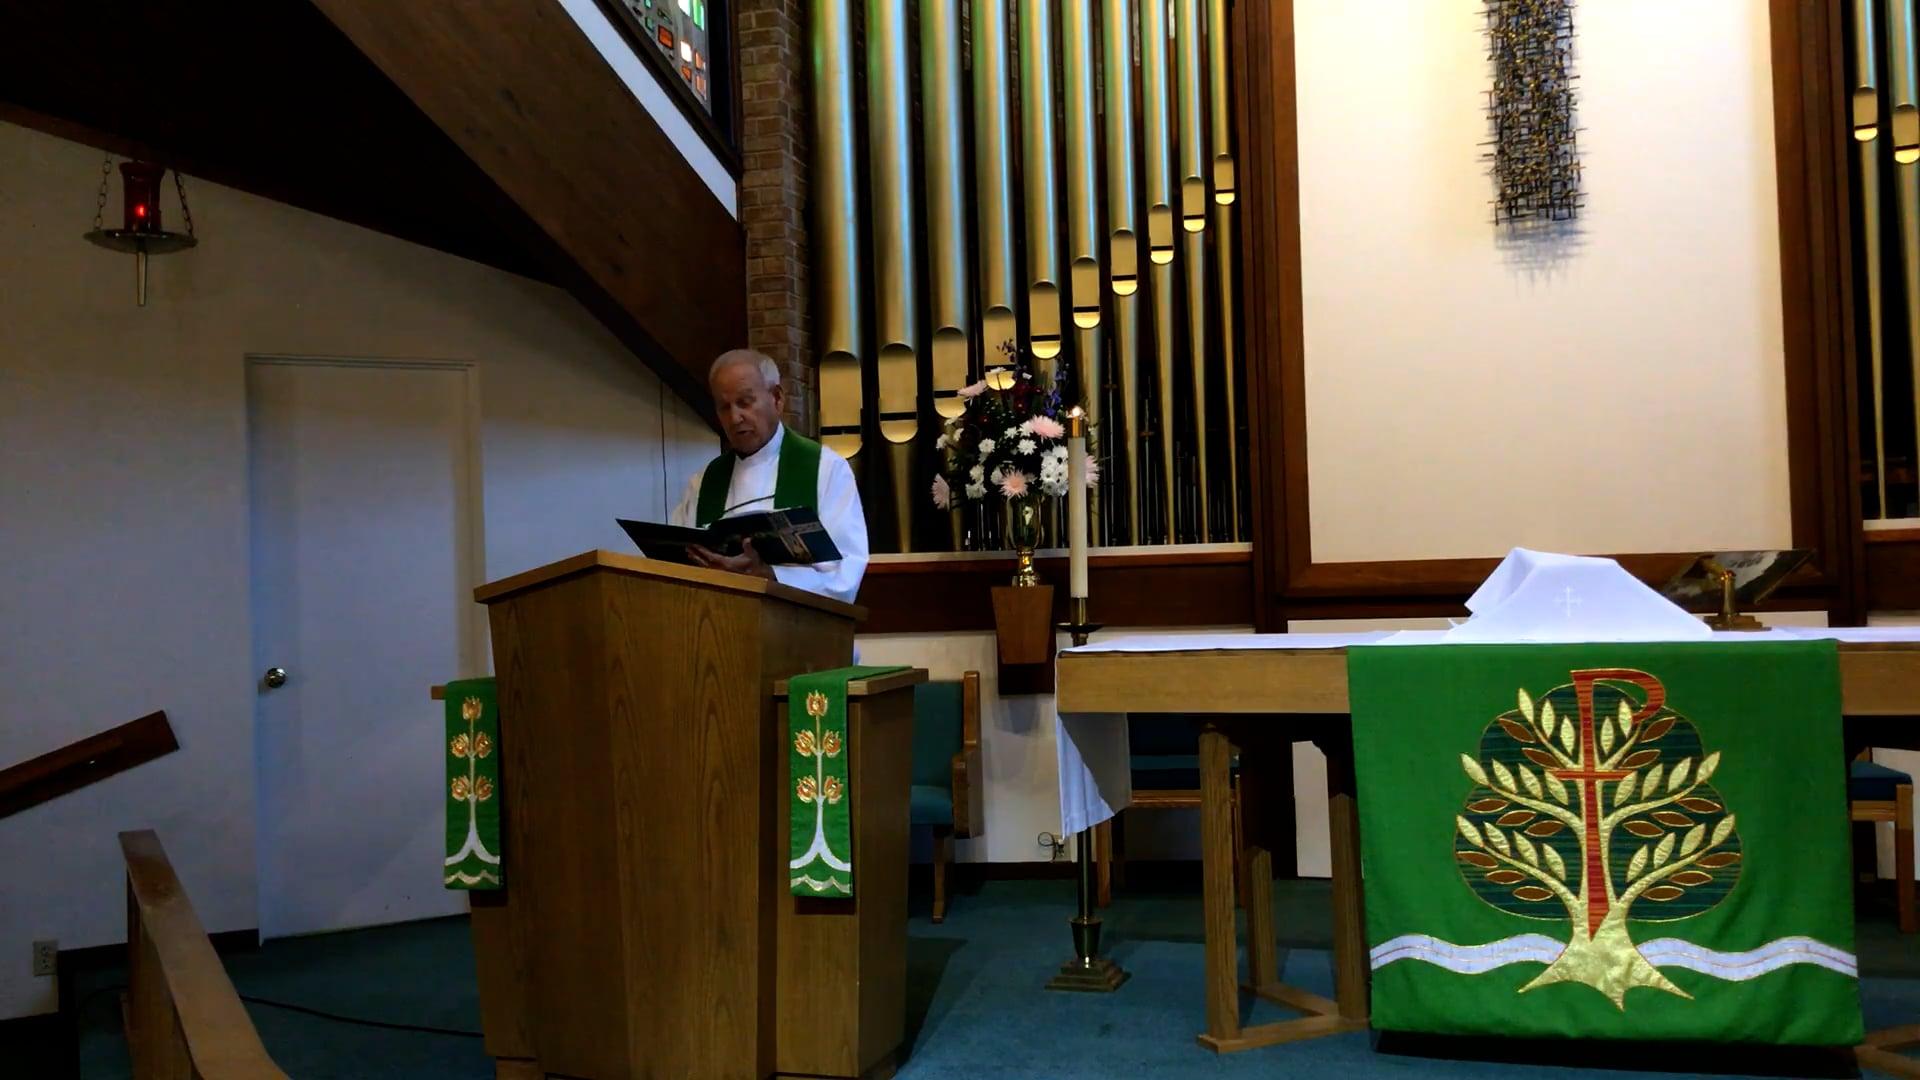 FLC Worship Service - Sept. 26, 2021